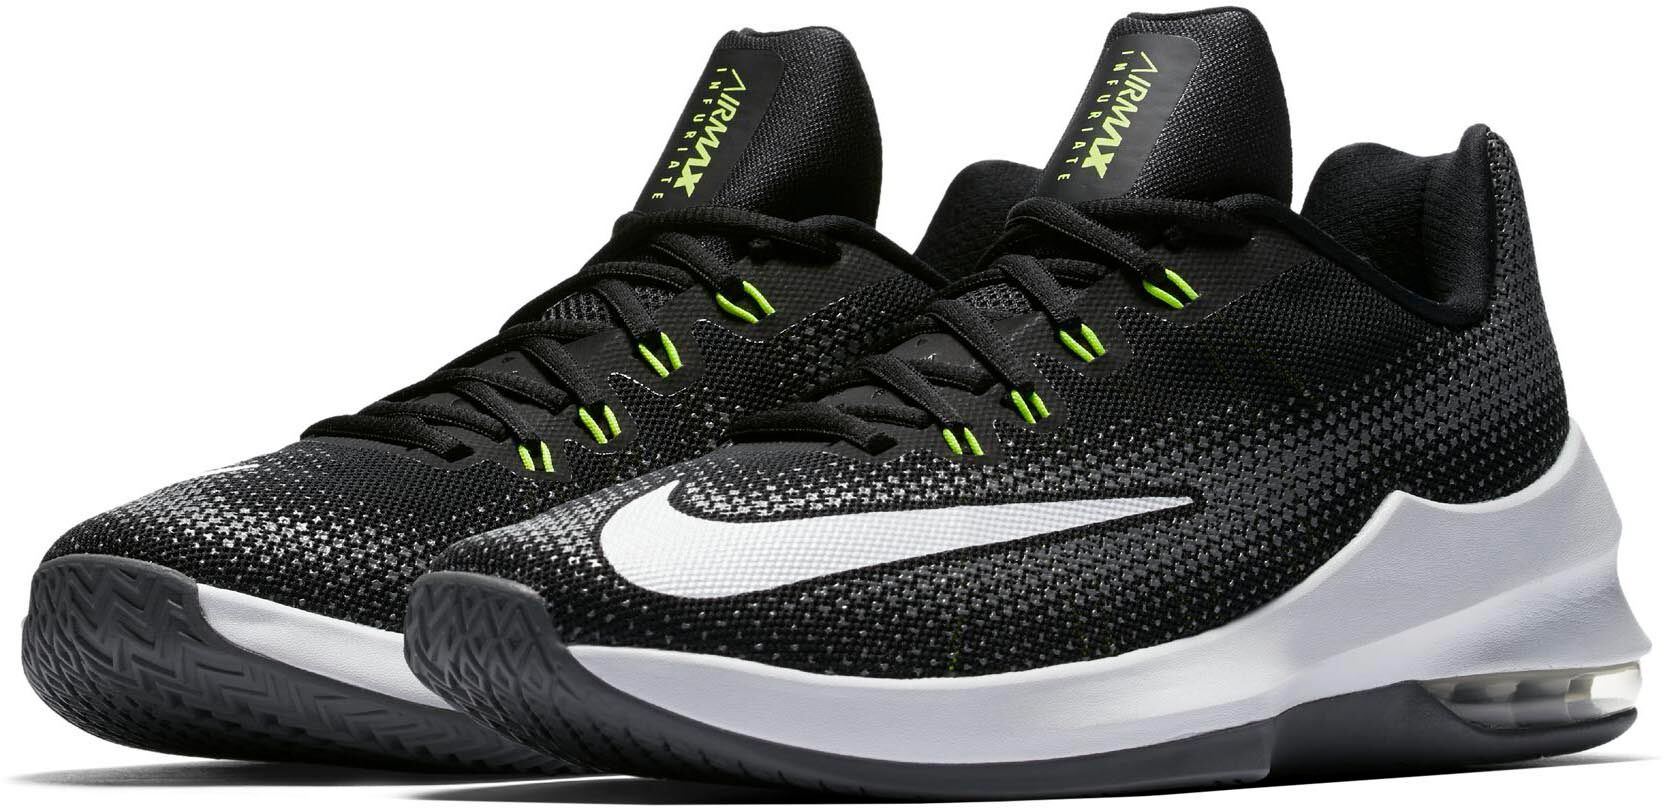 Nike Air Max Infuriate basketbalschoenen Heren Zwart